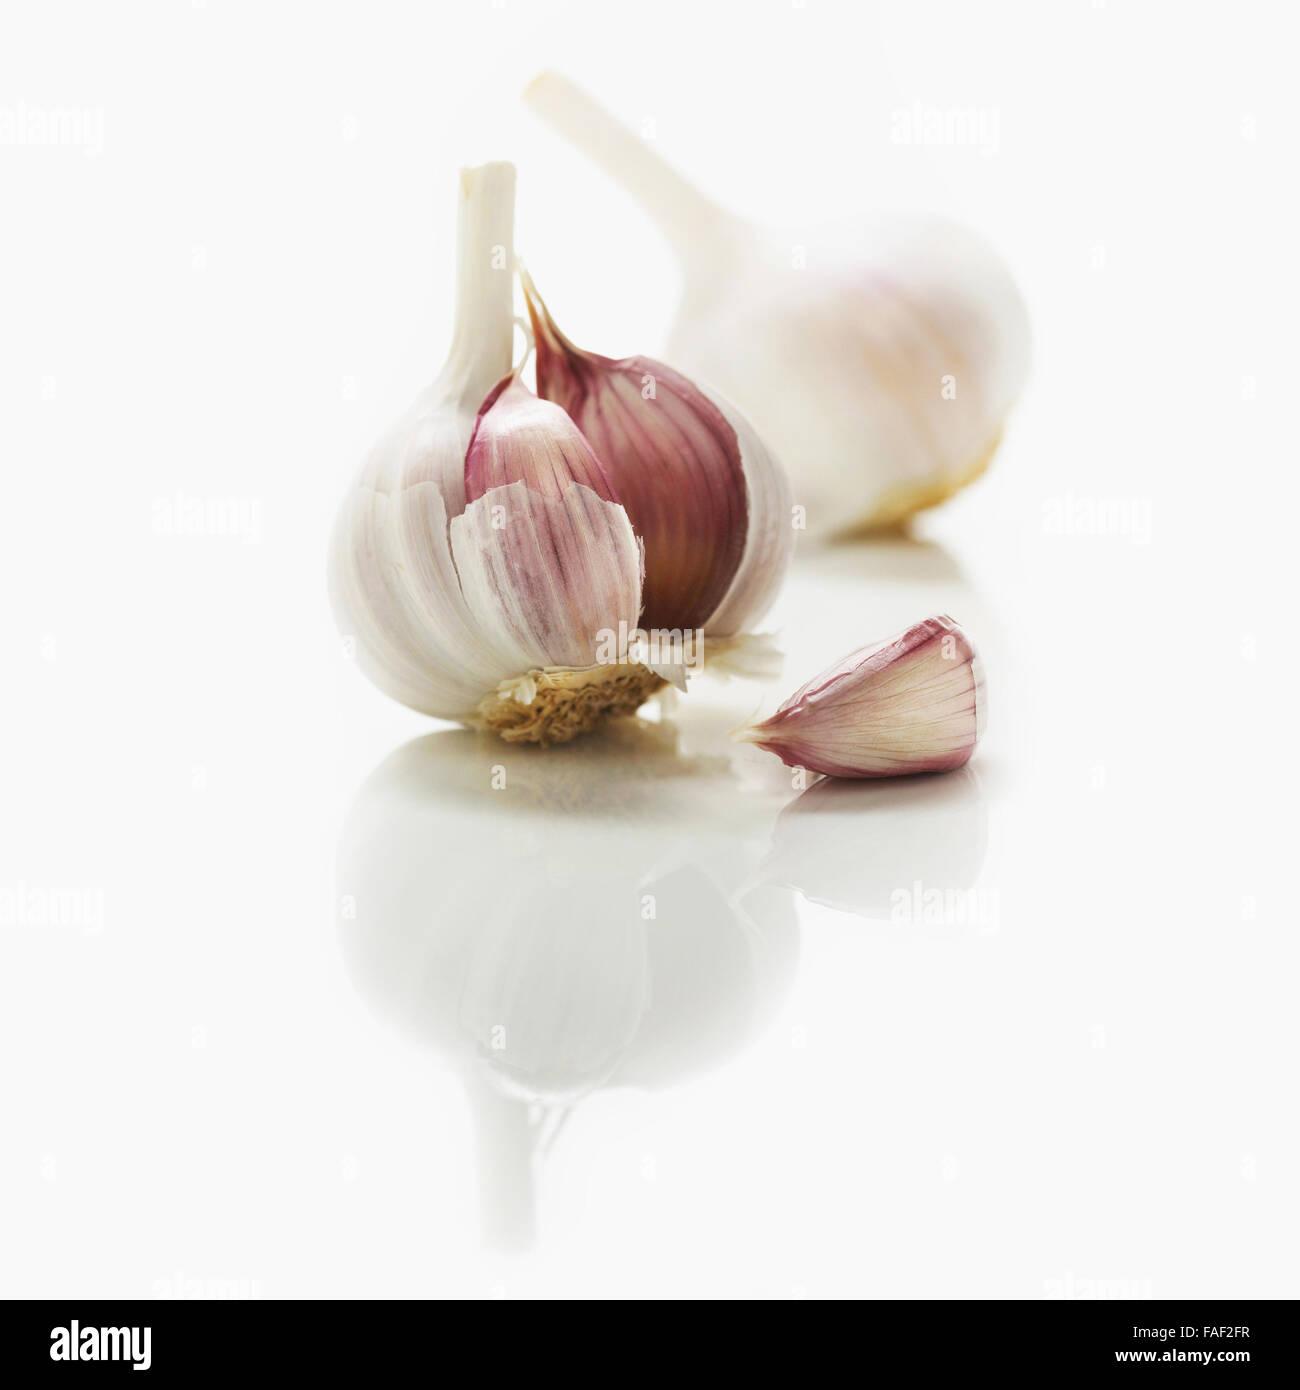 Fresh garlic bulbs on a white kitchen counter. - Stock Image